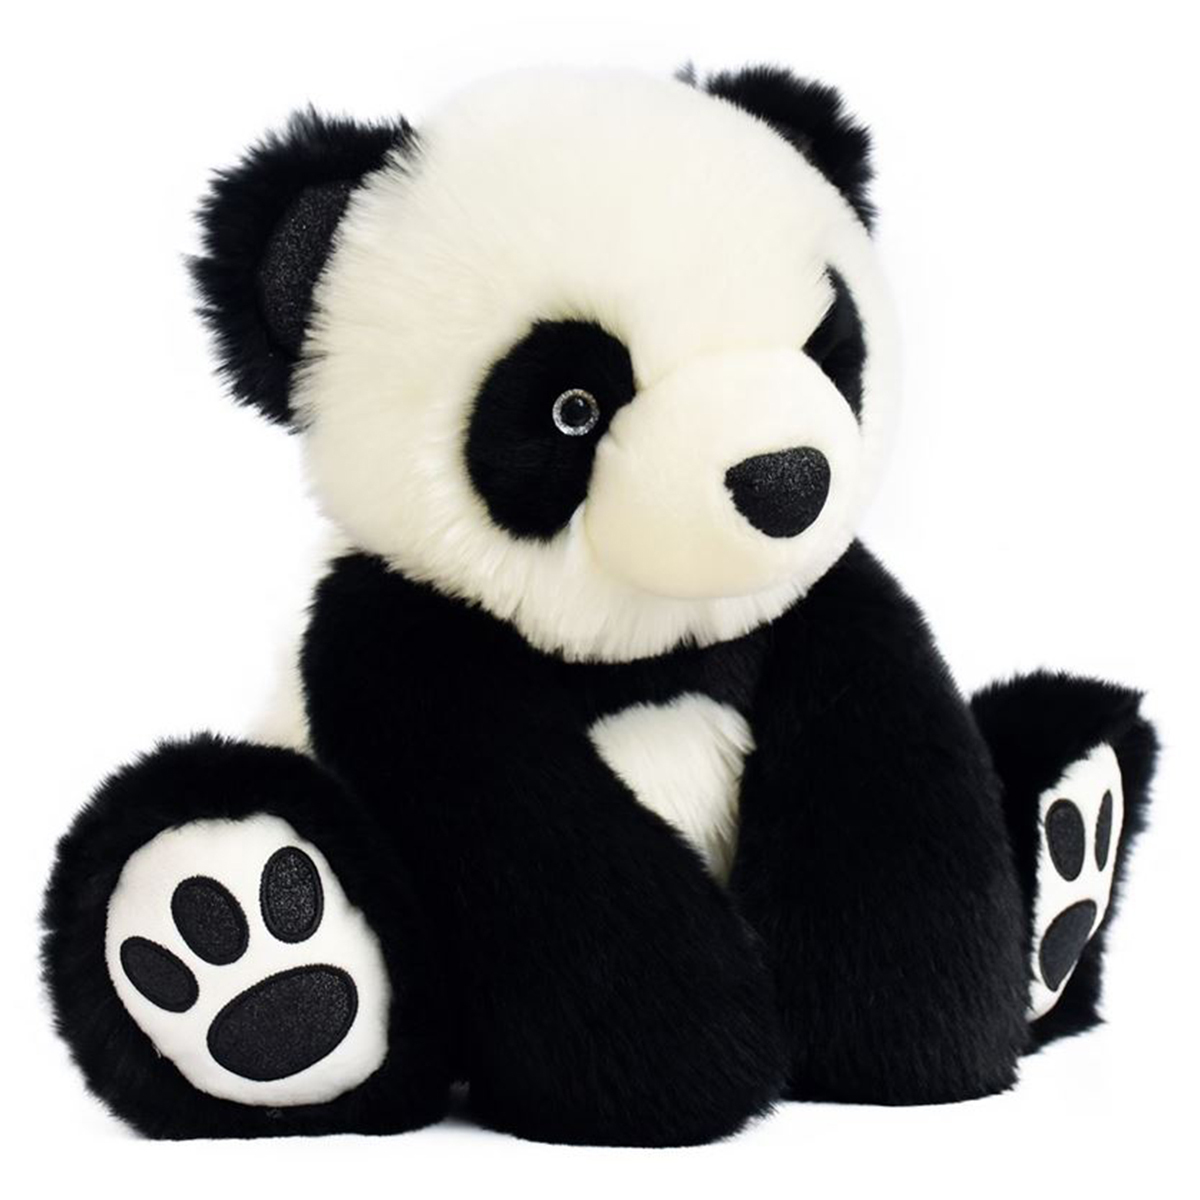 Peluche Peluche So Chic Panda - Moyen Peluche Panda So Chic 35 cm